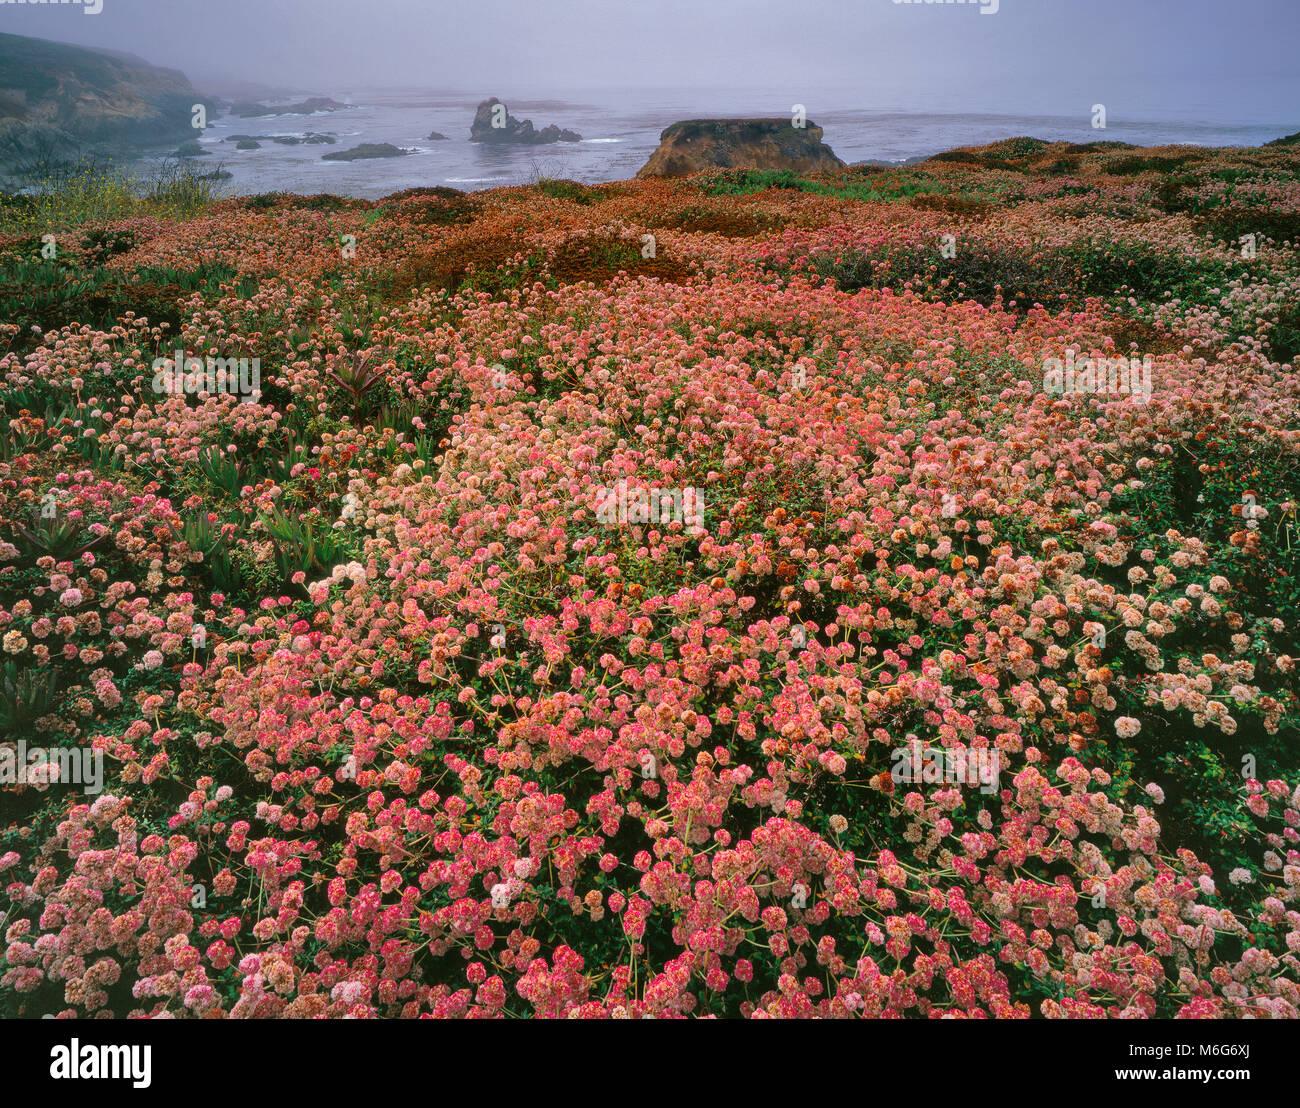 Buckwheat, Eriogonum, Coastal Fog, Garrapata State Park, Big Sur, Monterey County, California - Stock Image